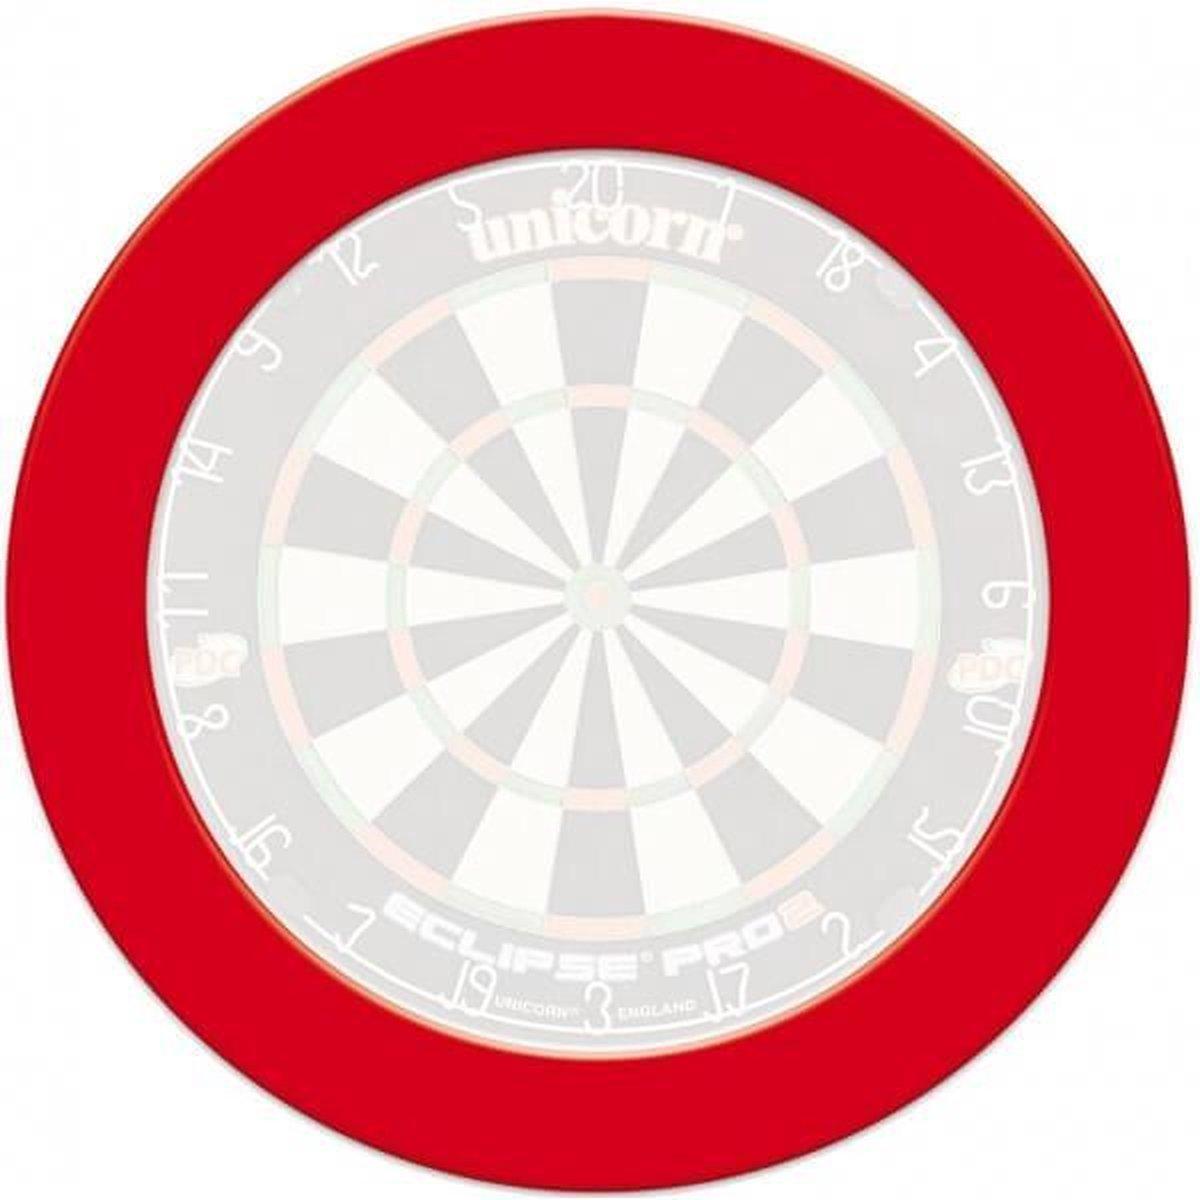 Unicorn - dartbord surround ring - slimline - rood - surround ring